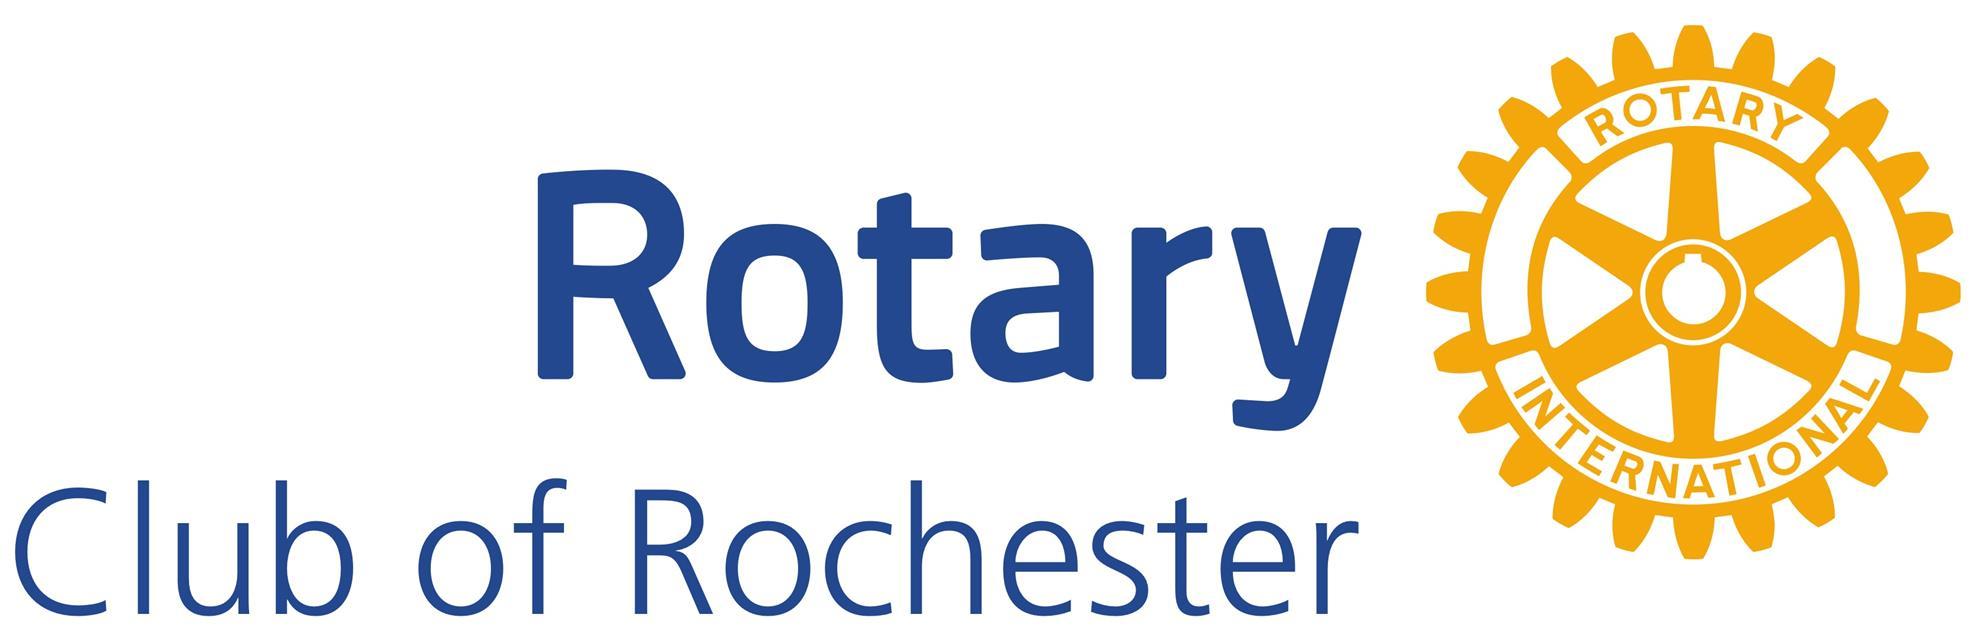 TRCR logo